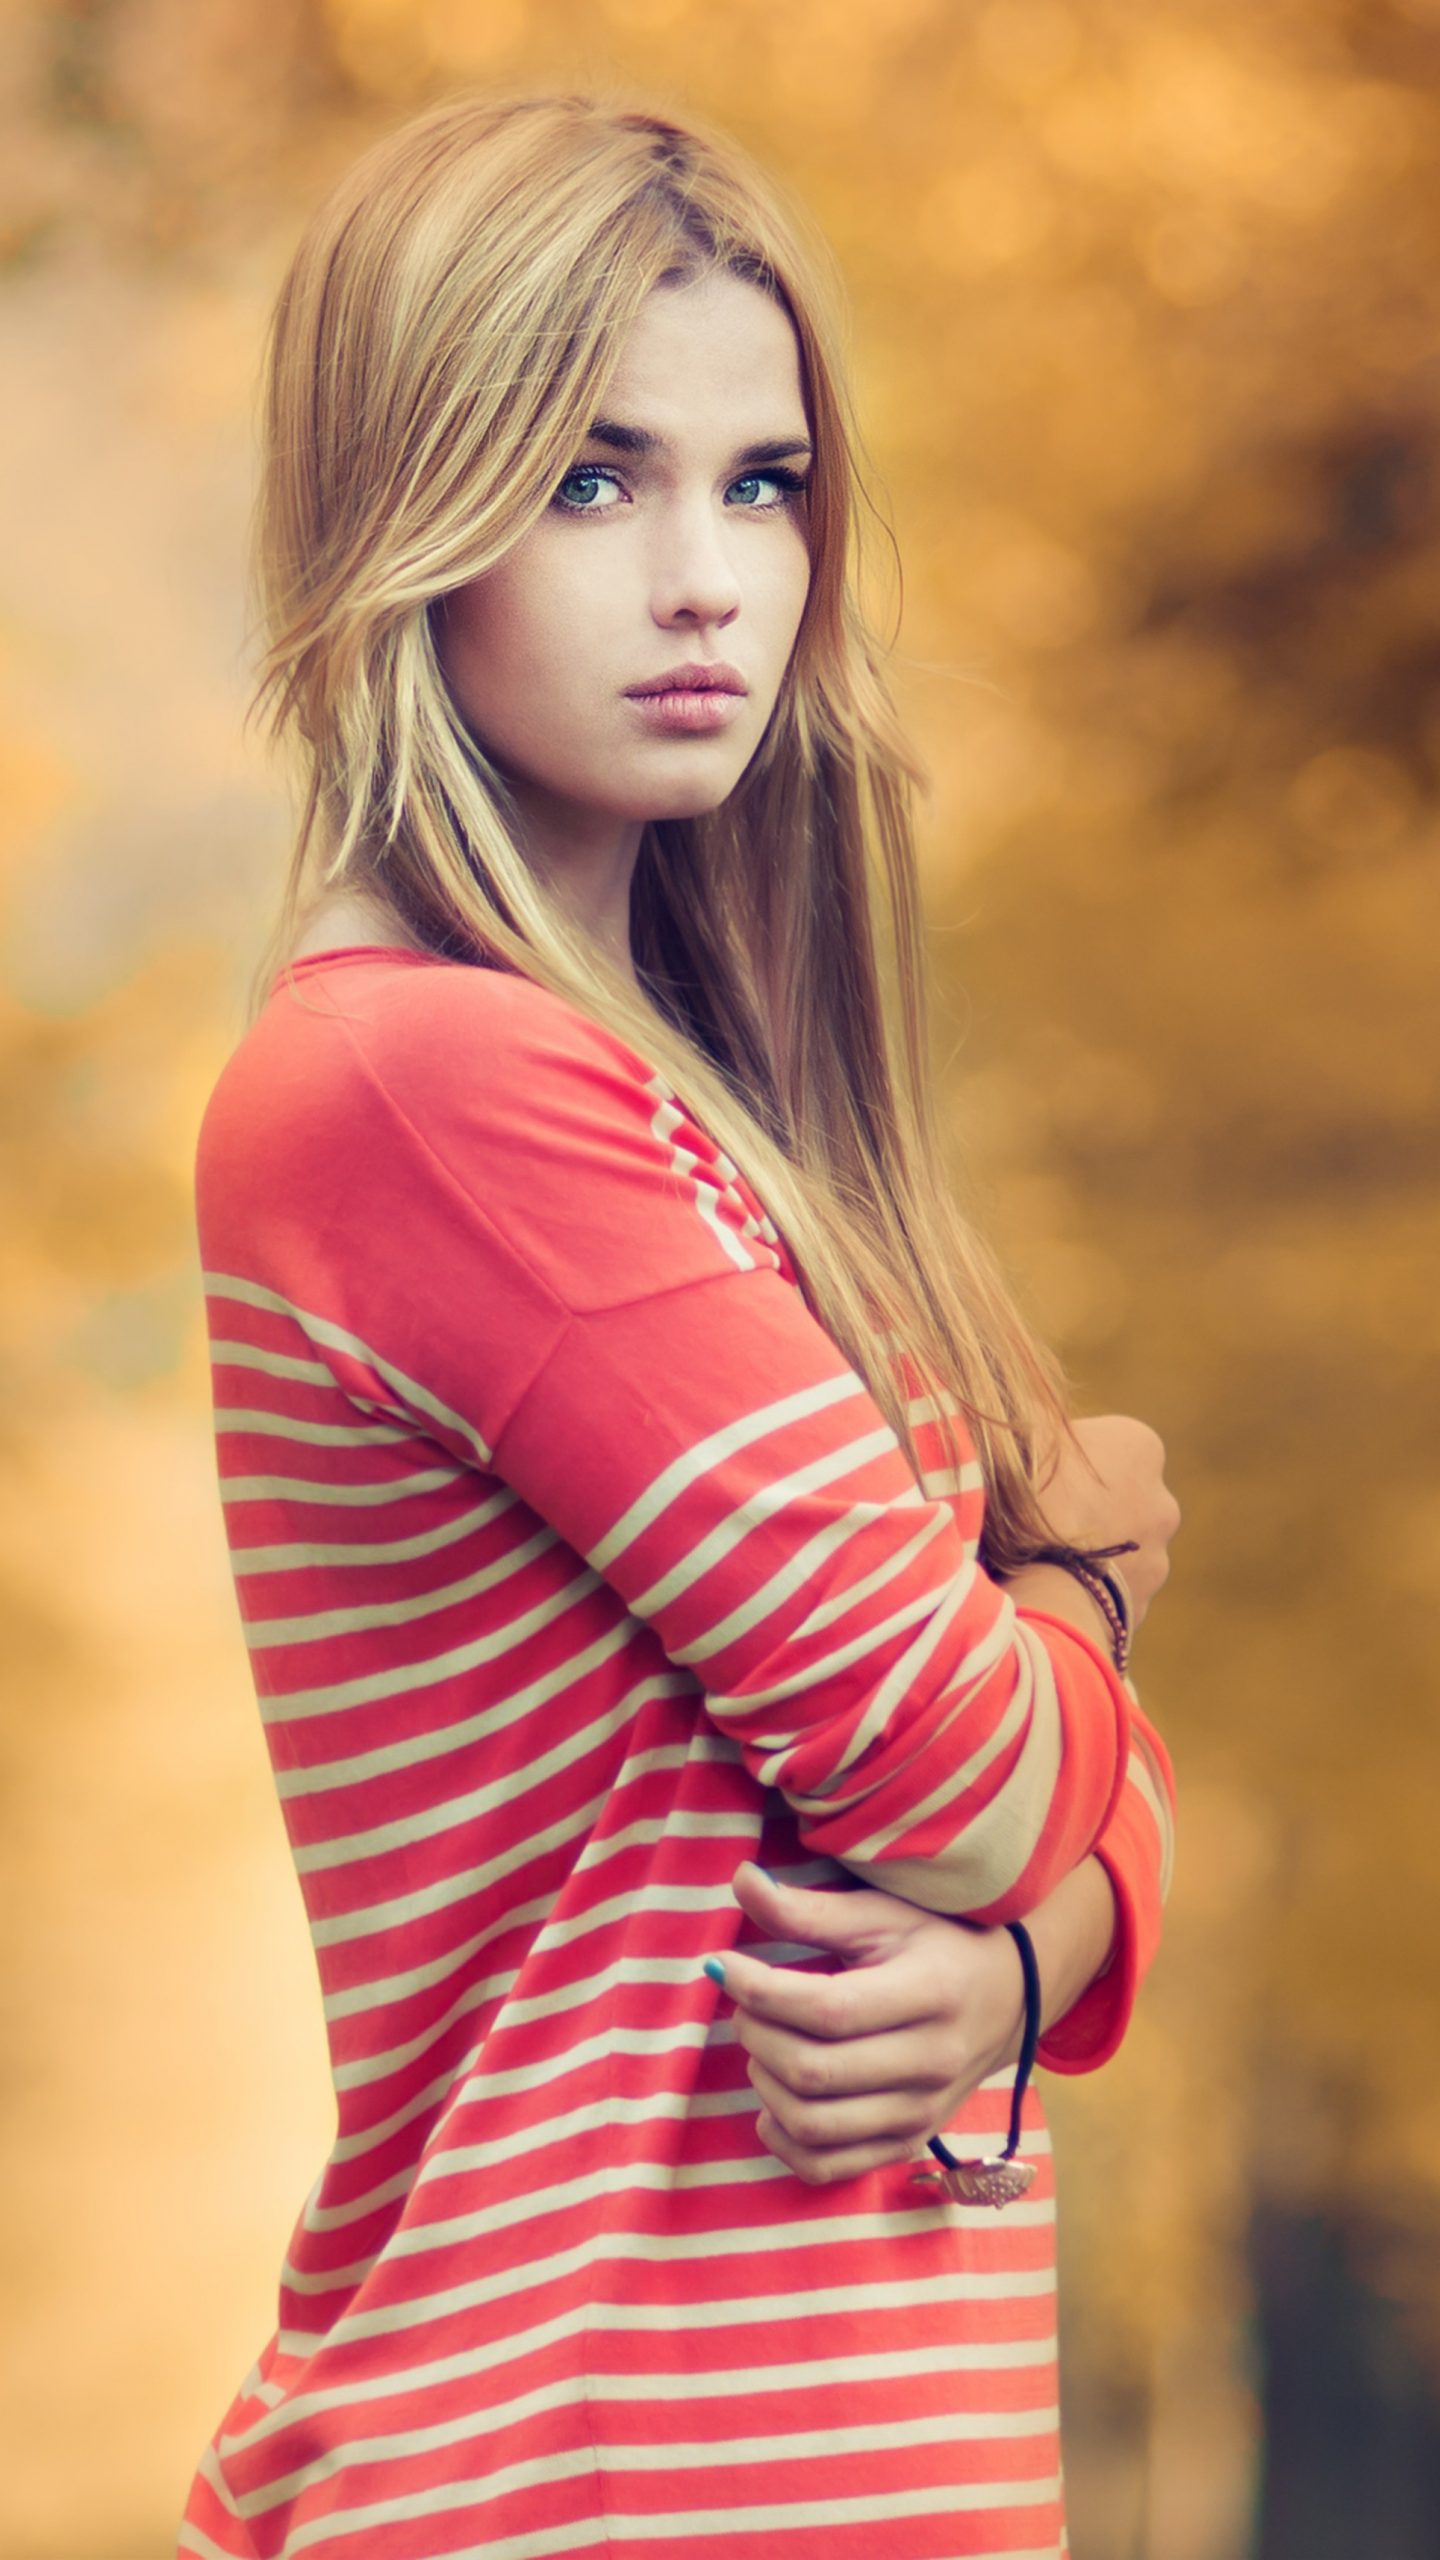 Girl In Red Beautiful Bokeh 4K Wallpaper - Best Wallpapers-9741